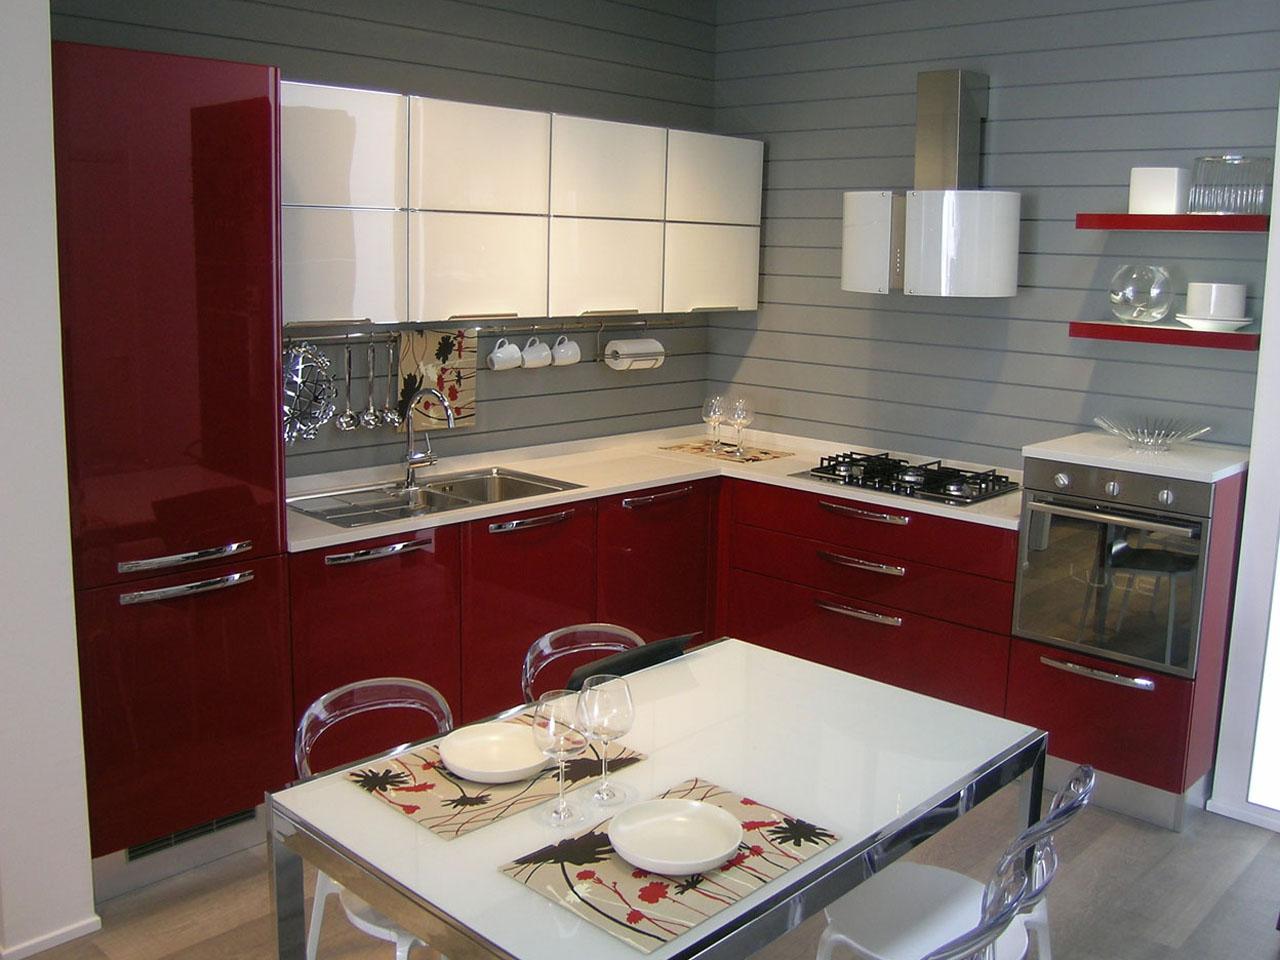 BRAND NEW OPENING LUBE - Kitchens Lube